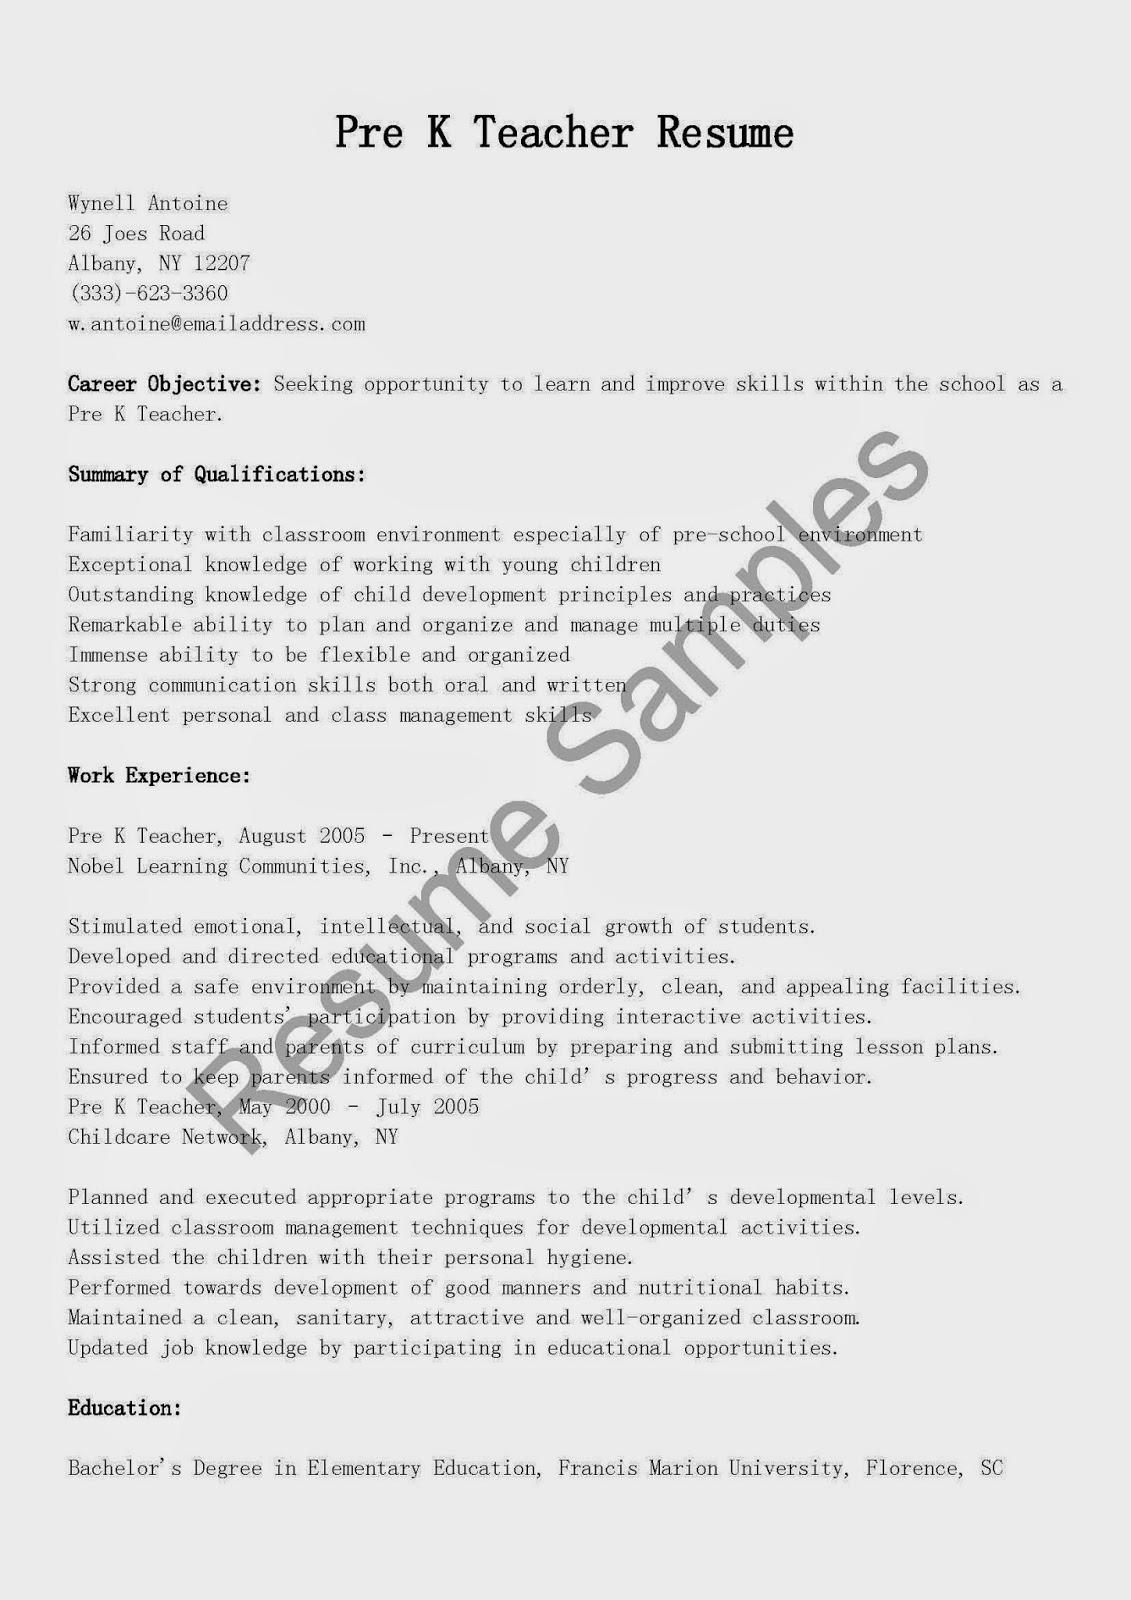 pre primary school teacher resume sample - resume samples pre k teacher resume sample